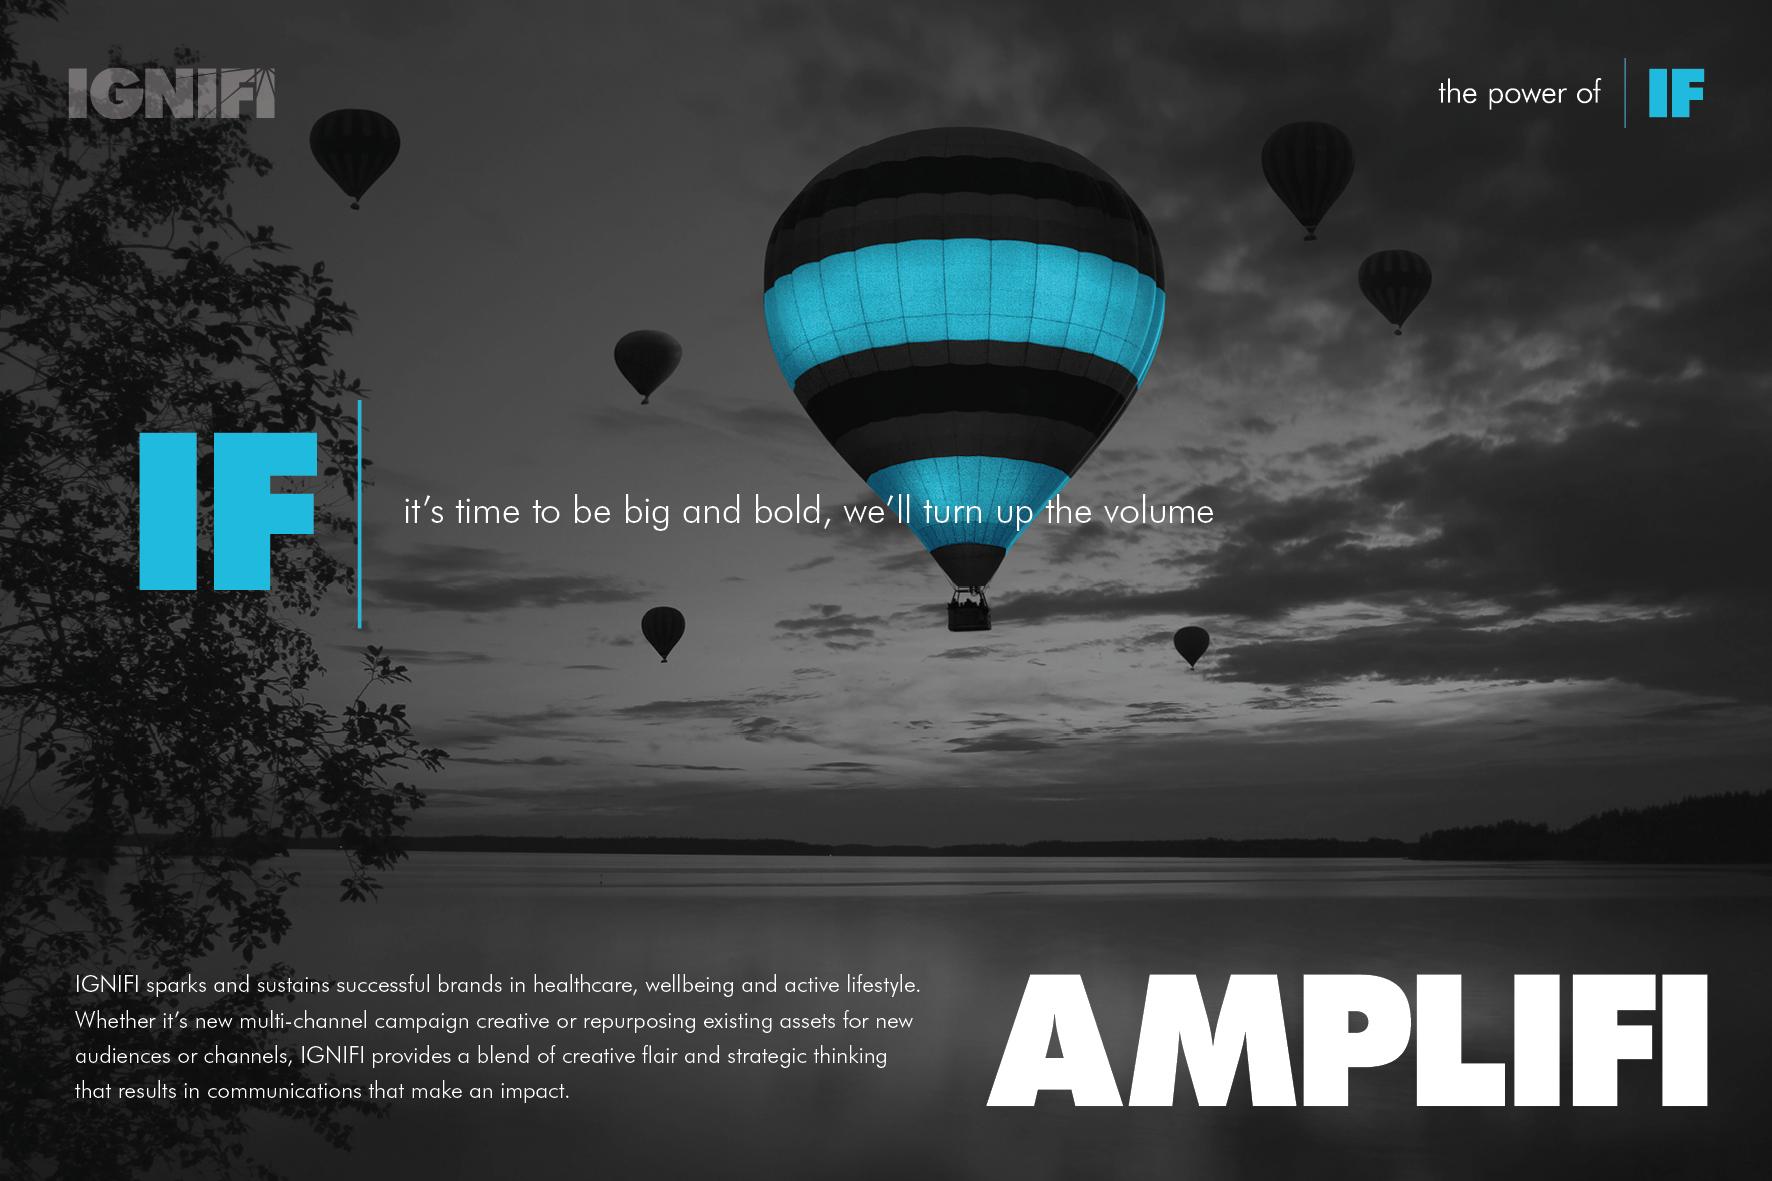 000800_033_PM_hub_landscape_ignifi_AMPLIFI.jpg